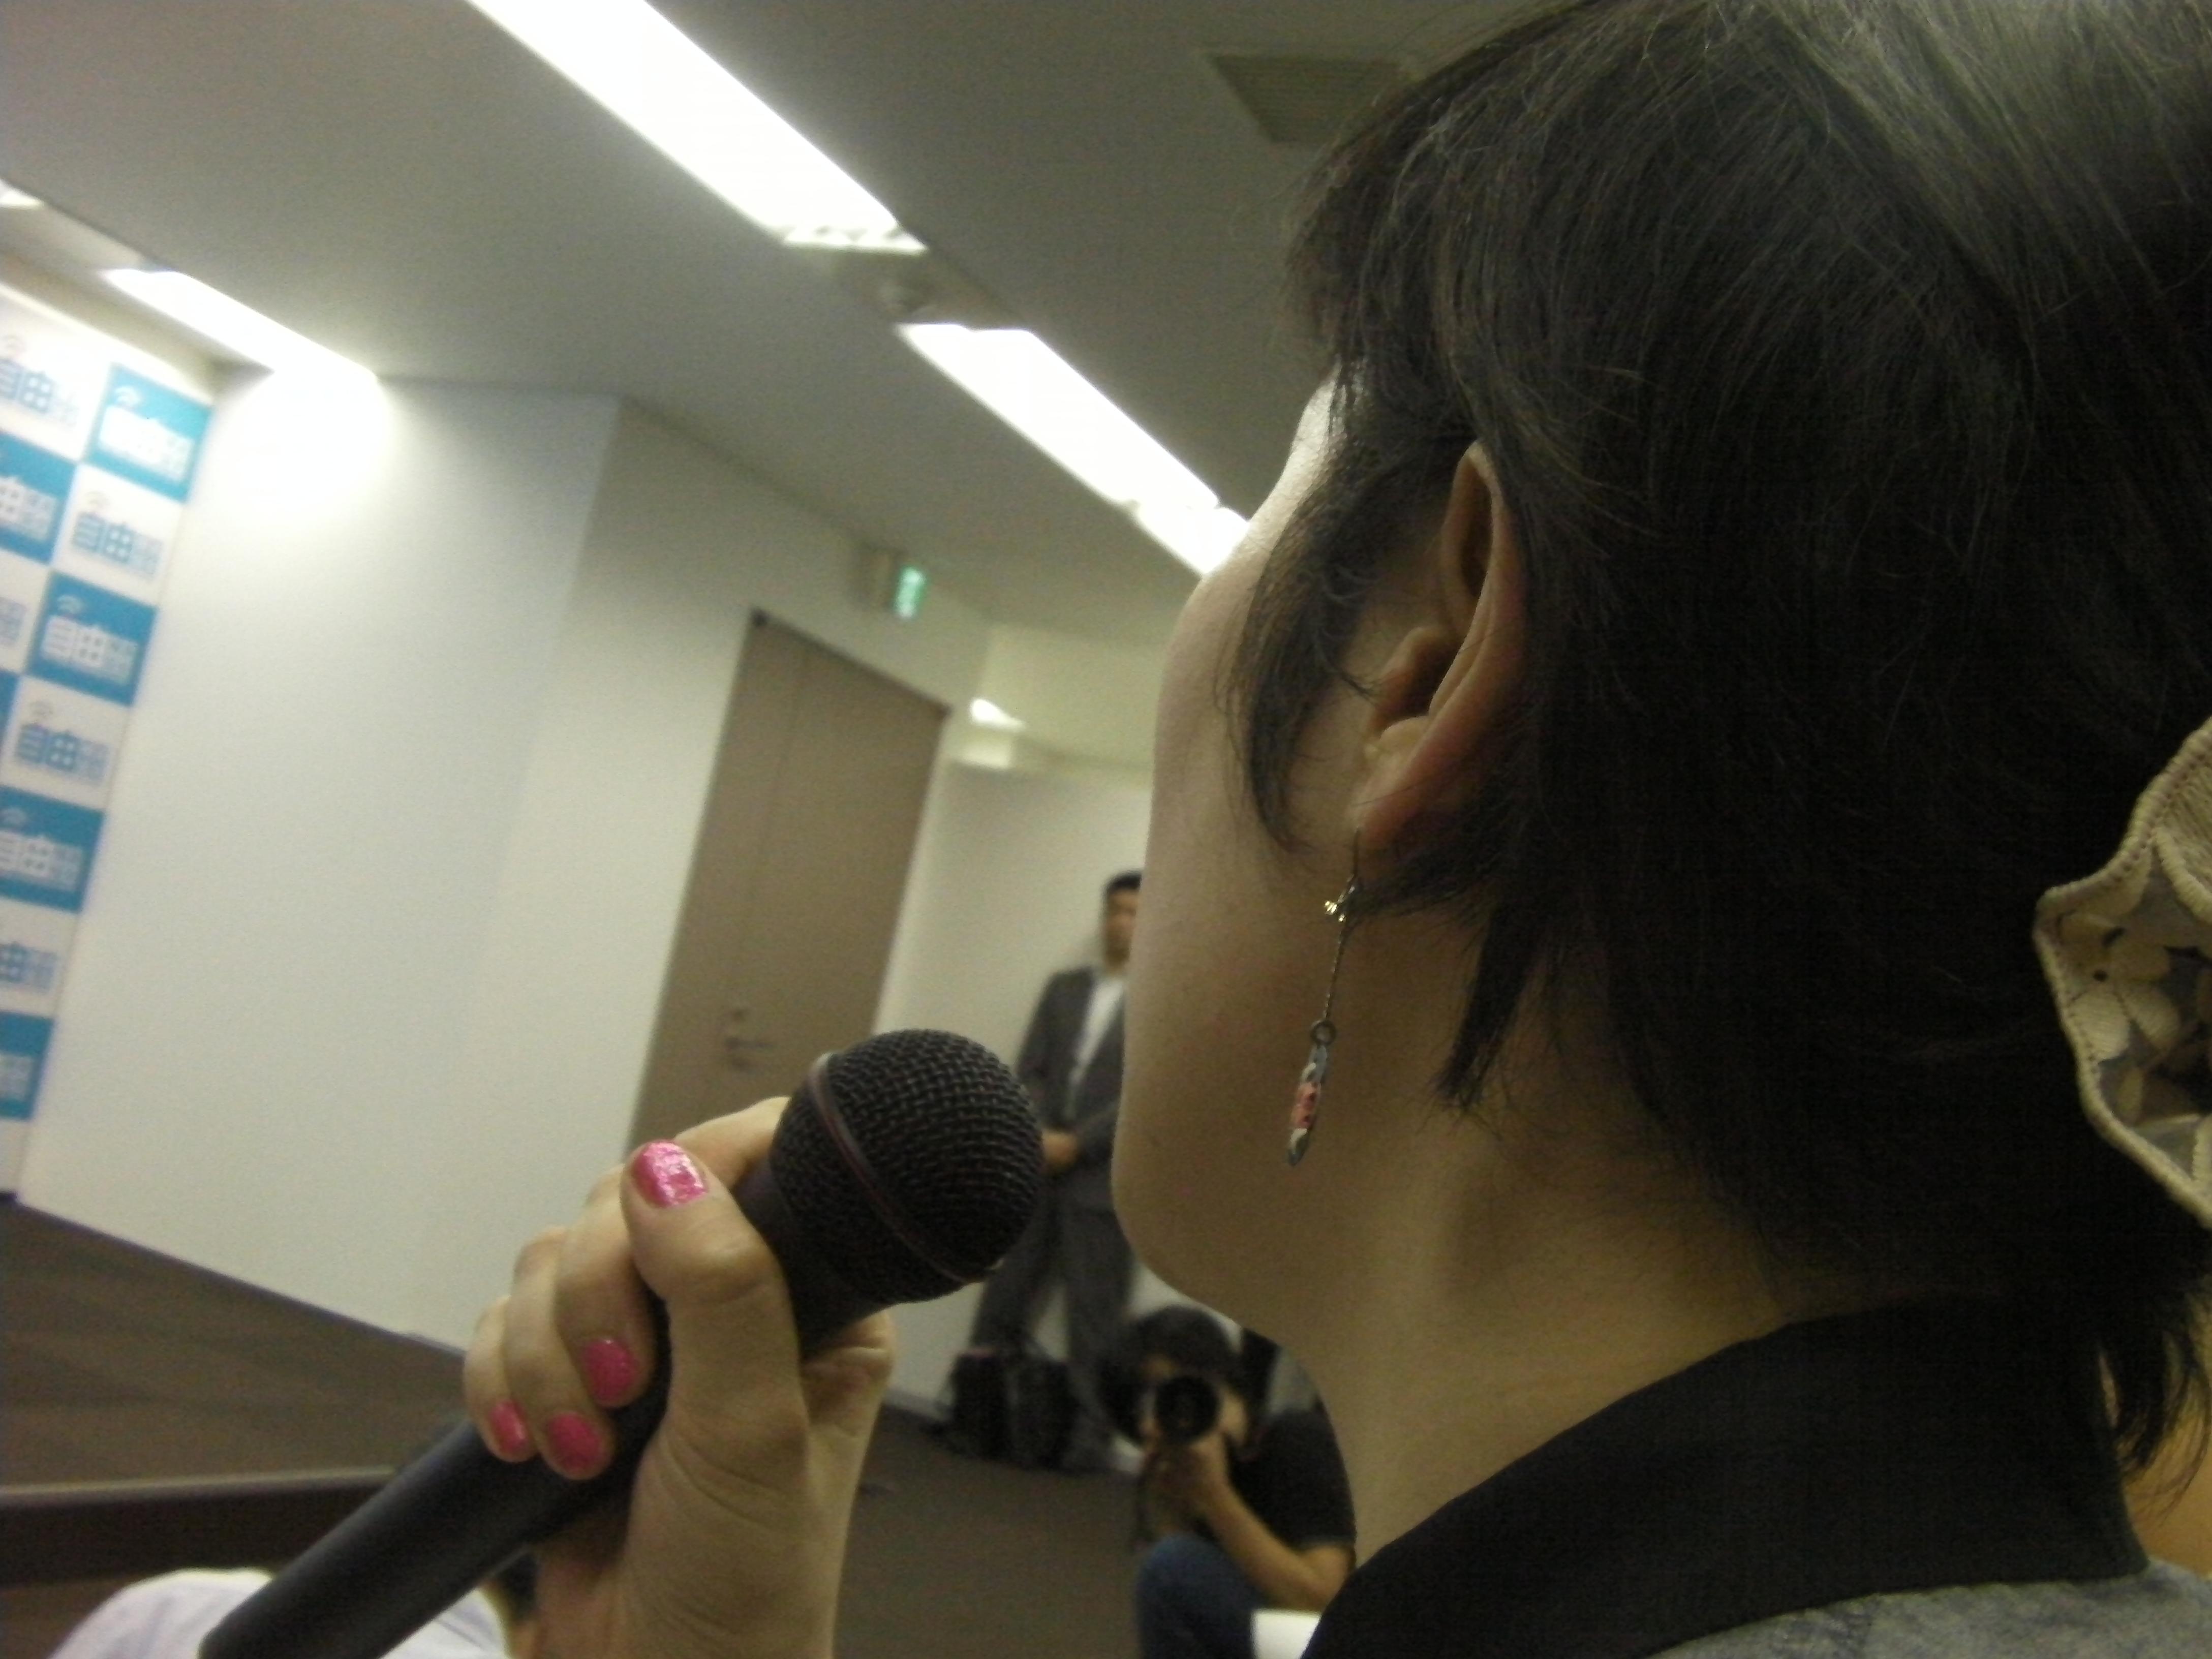 http://daily.magazine9.jp/m9/oshidori/SANY0291.JPG